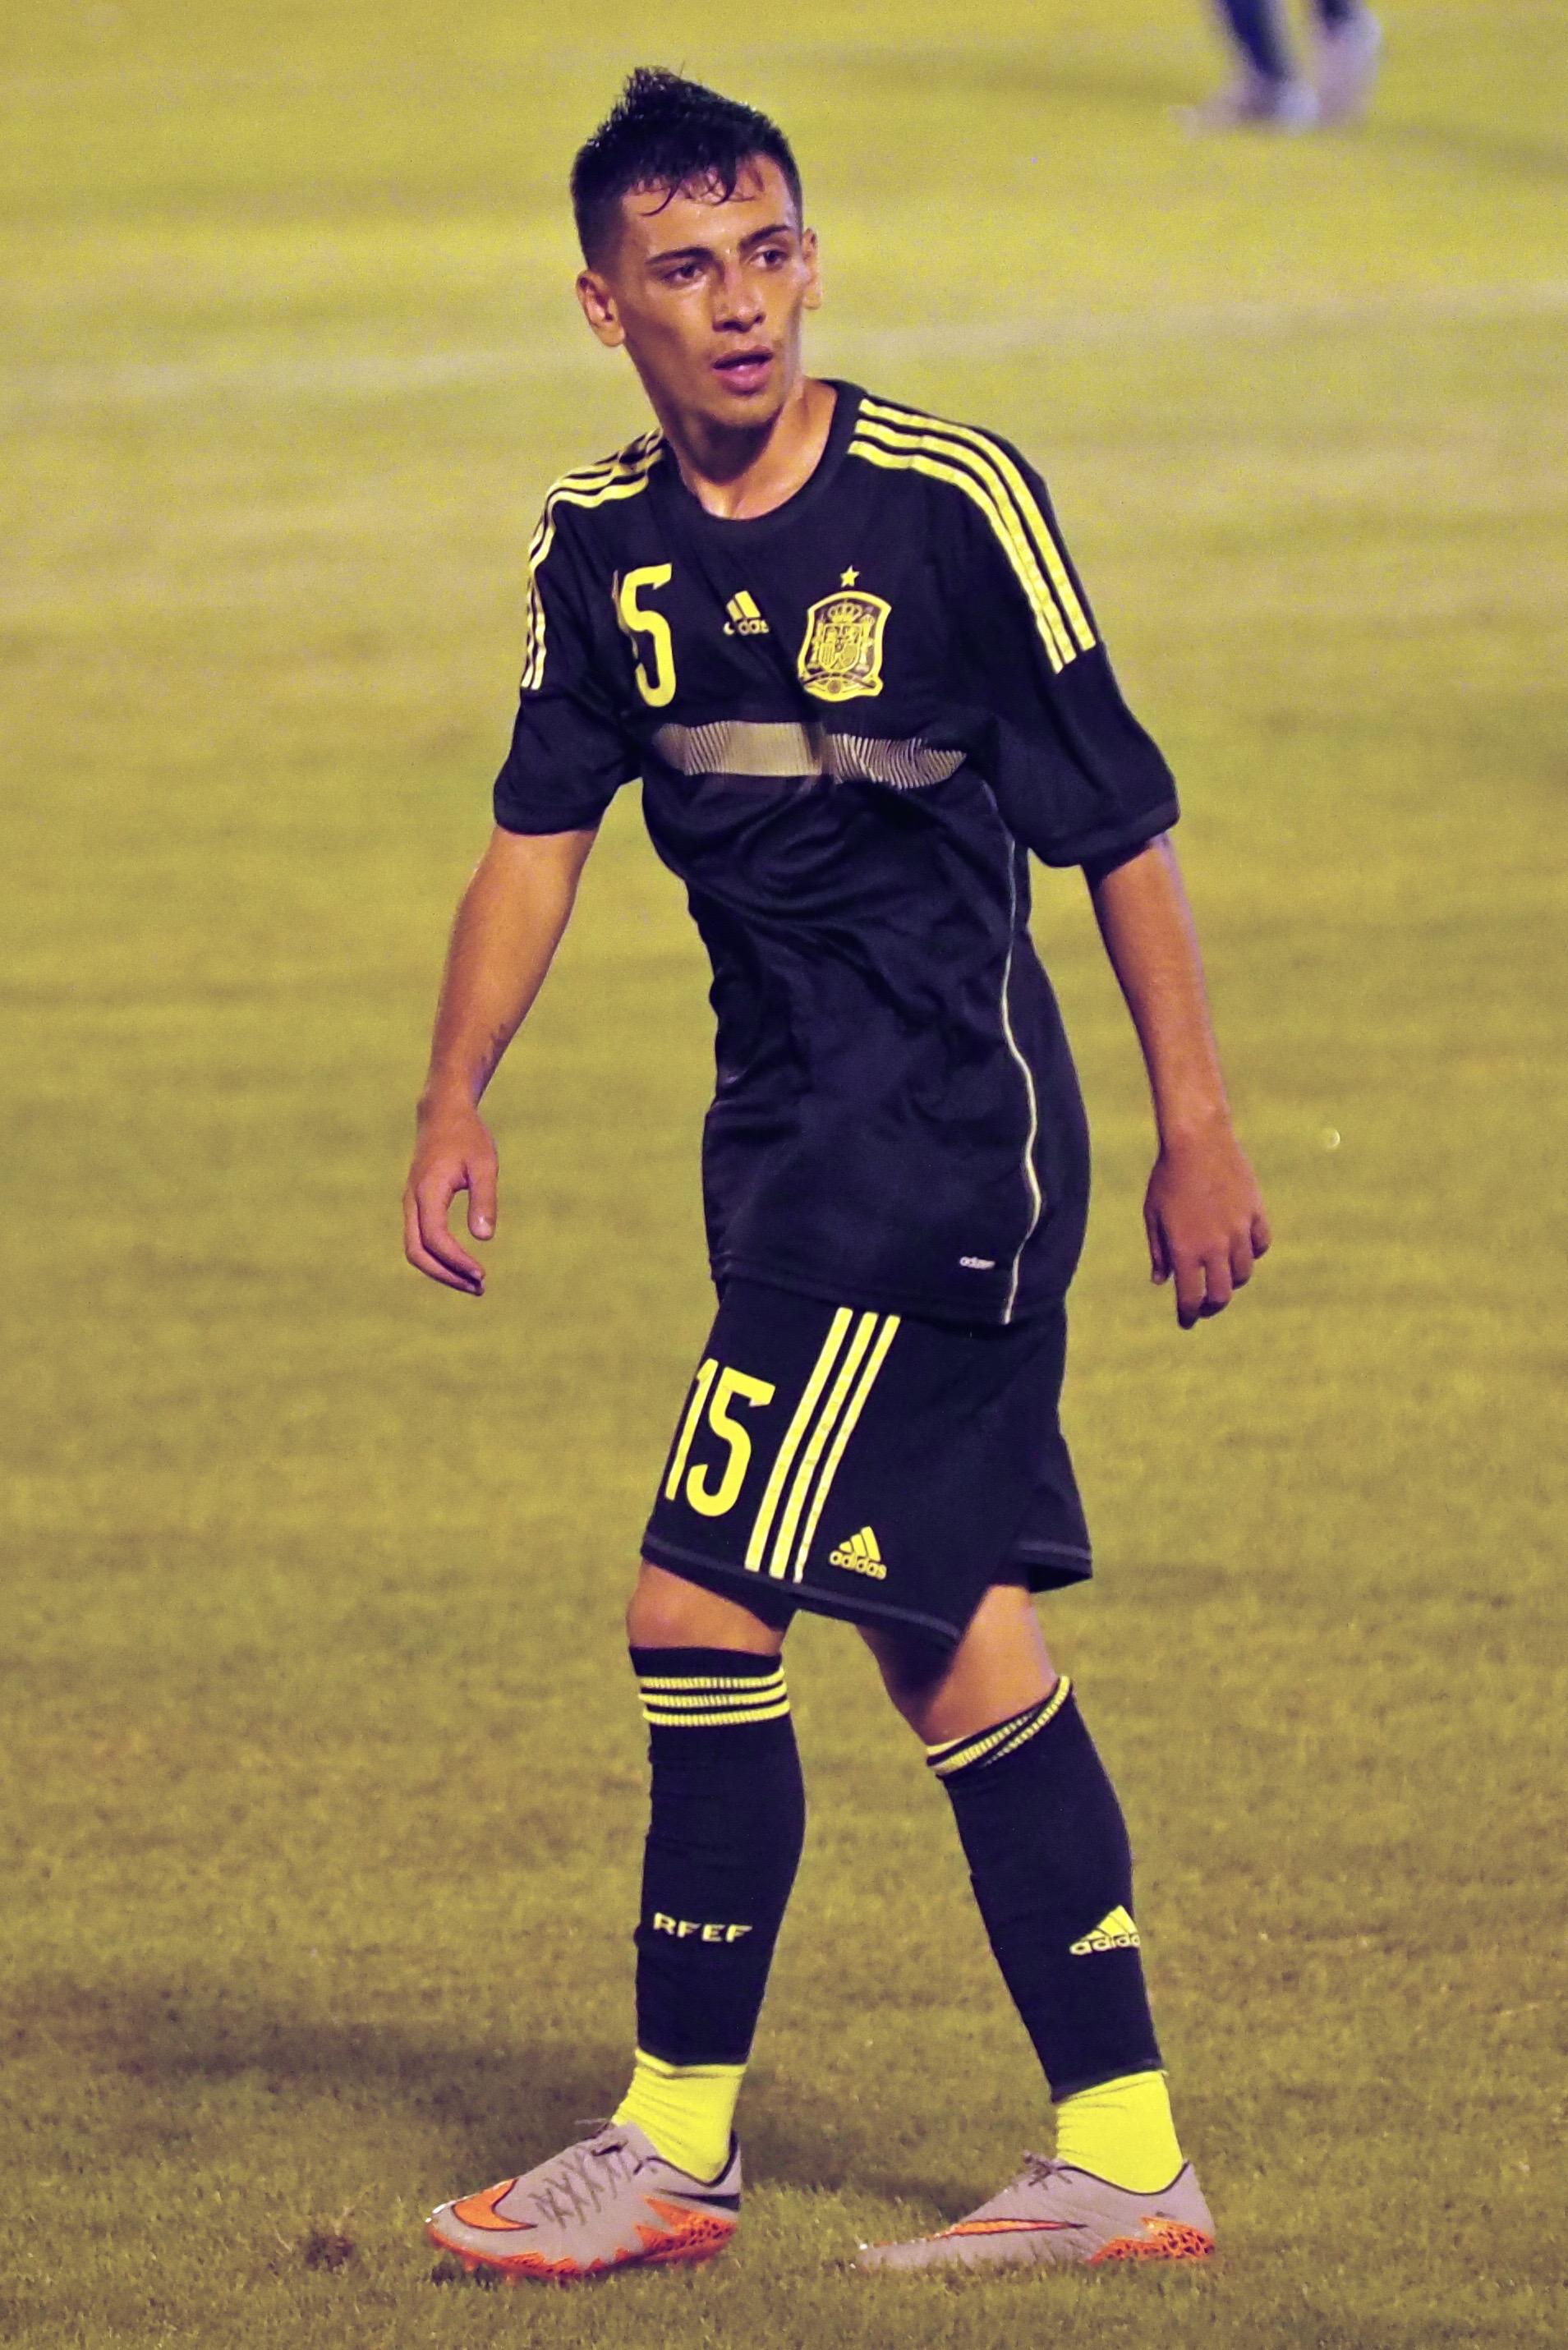 https://upload.wikimedia.org/wikipedia/commons/3/37/Gaspar_Panadero_SBS_Cup_2015.jpg